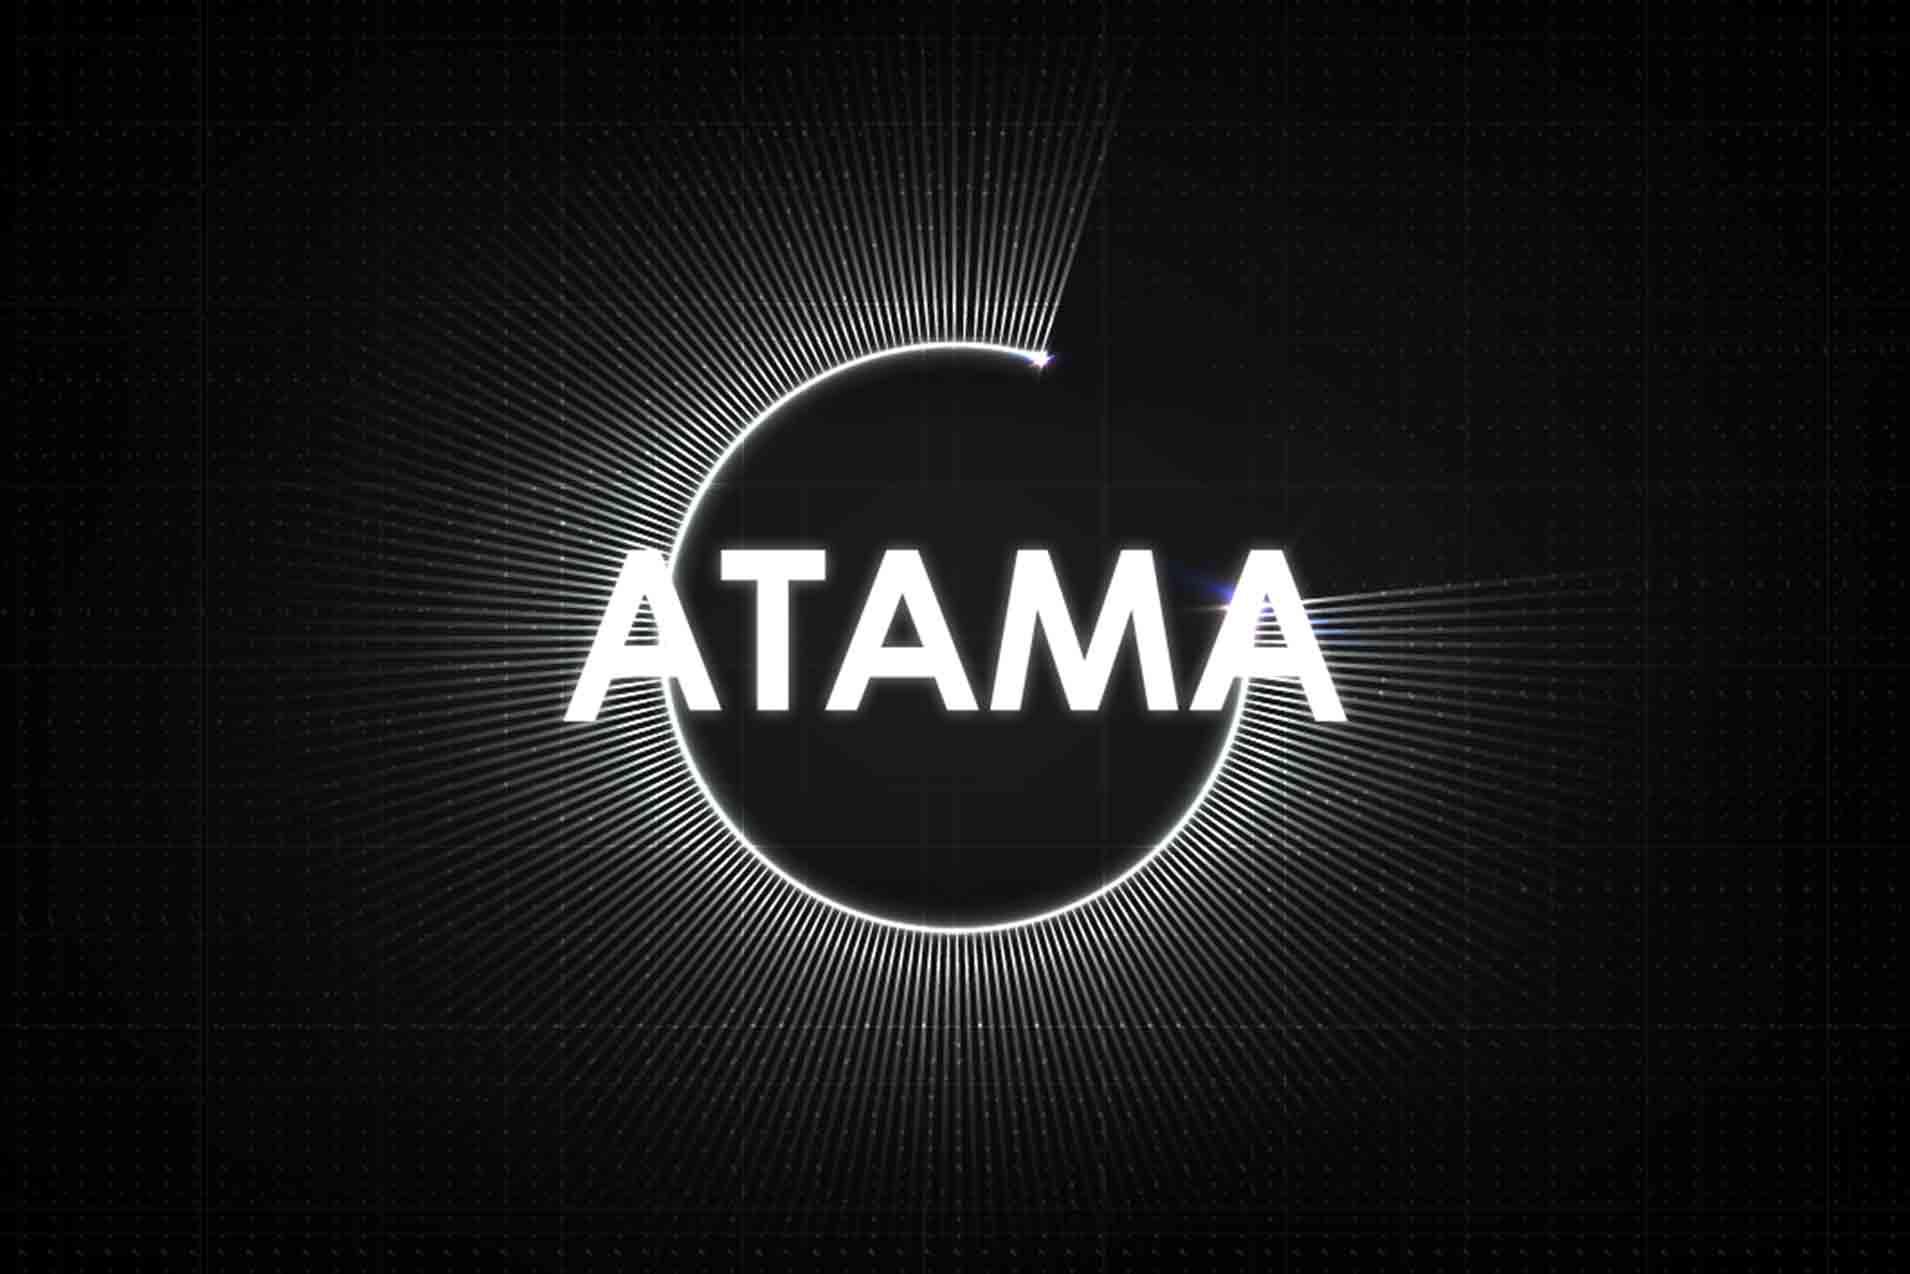 ATAMA Launched